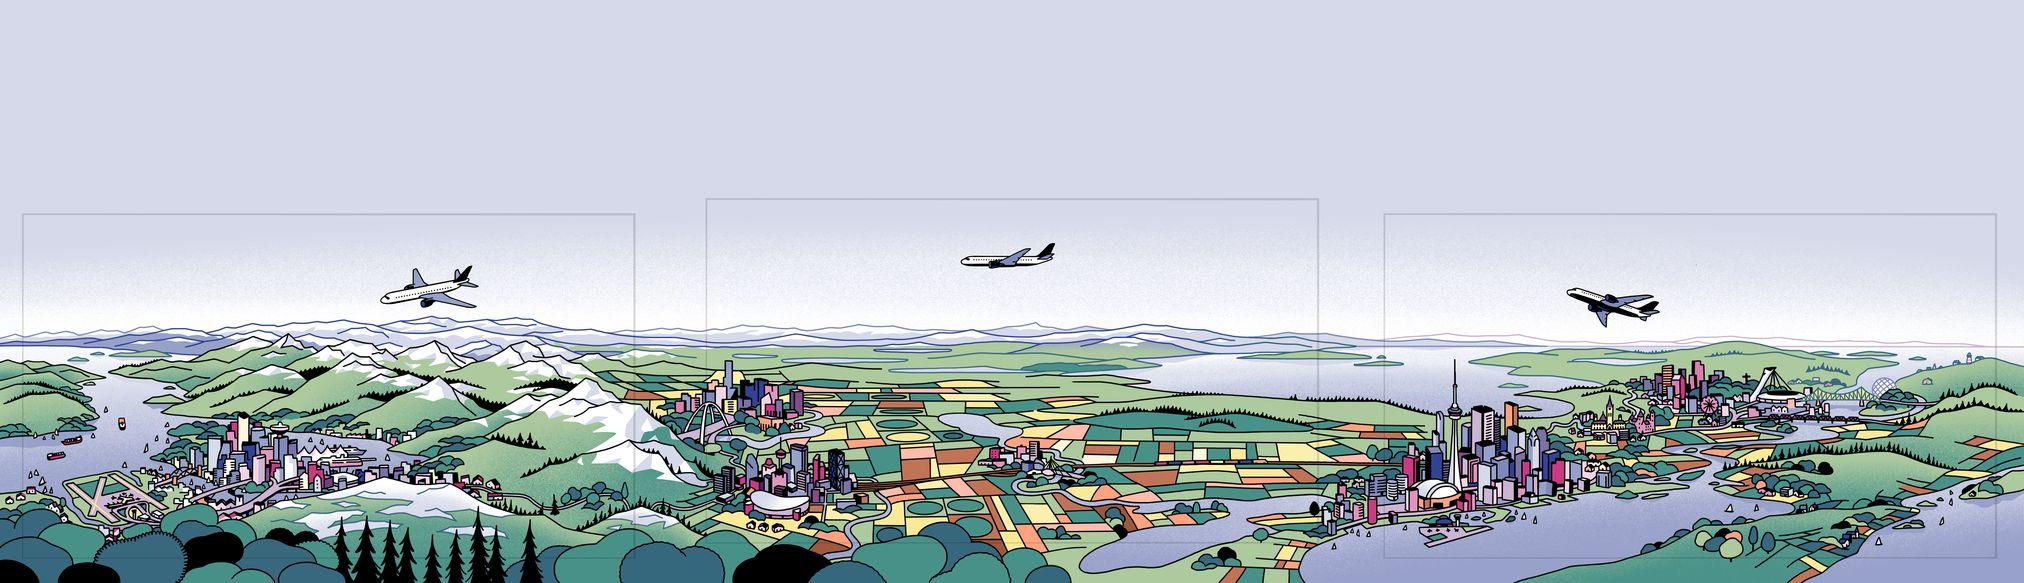 garance-illustration-8_web